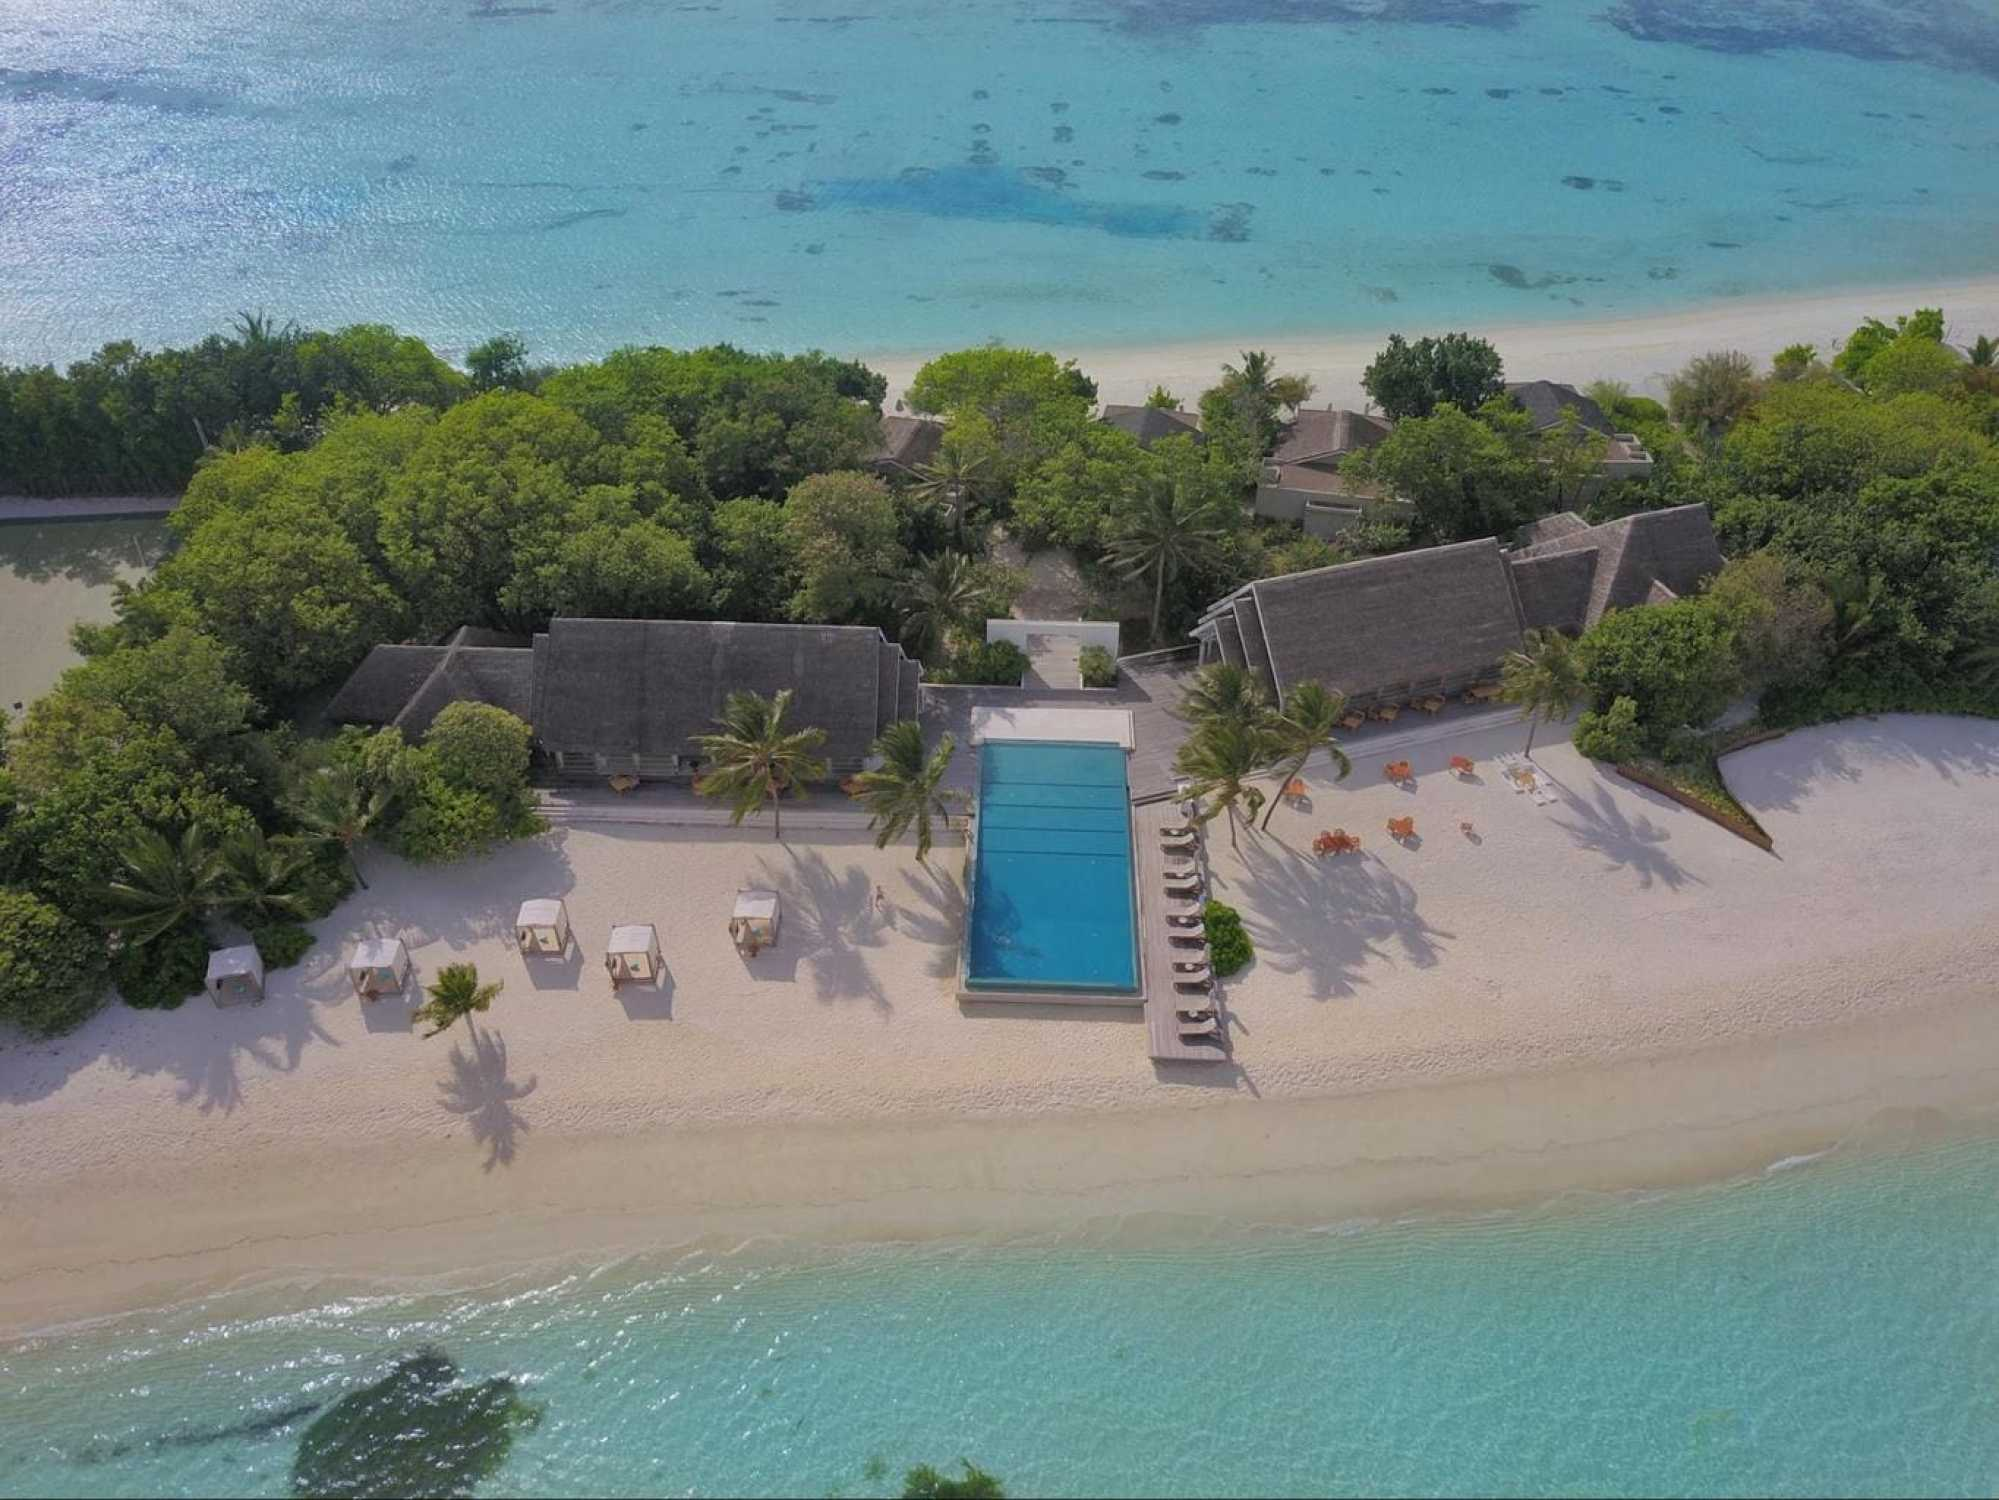 Veli Bar pool at LUX* Maldives